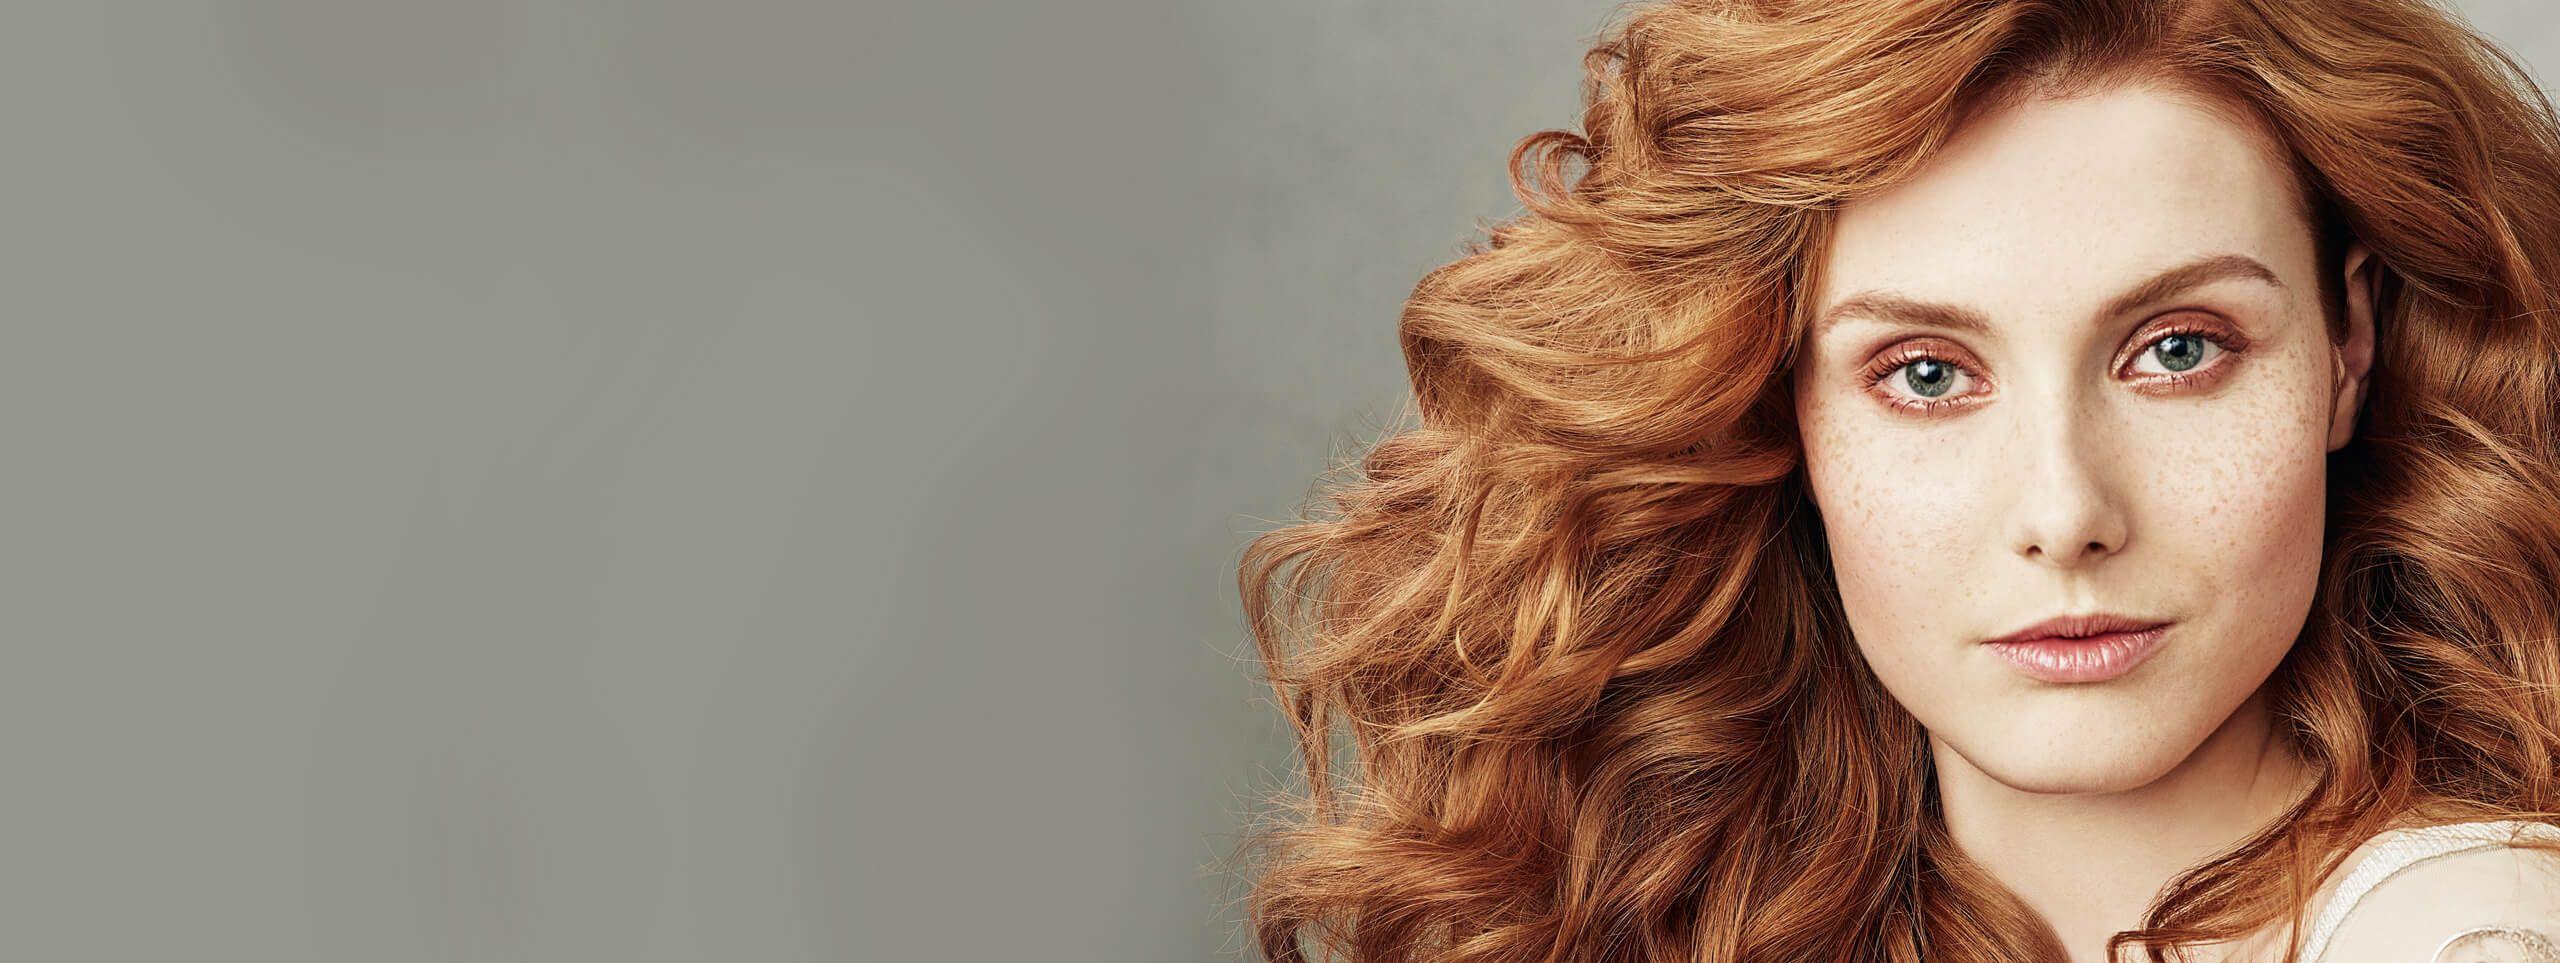 Model rocks voluminous curly hairstyle